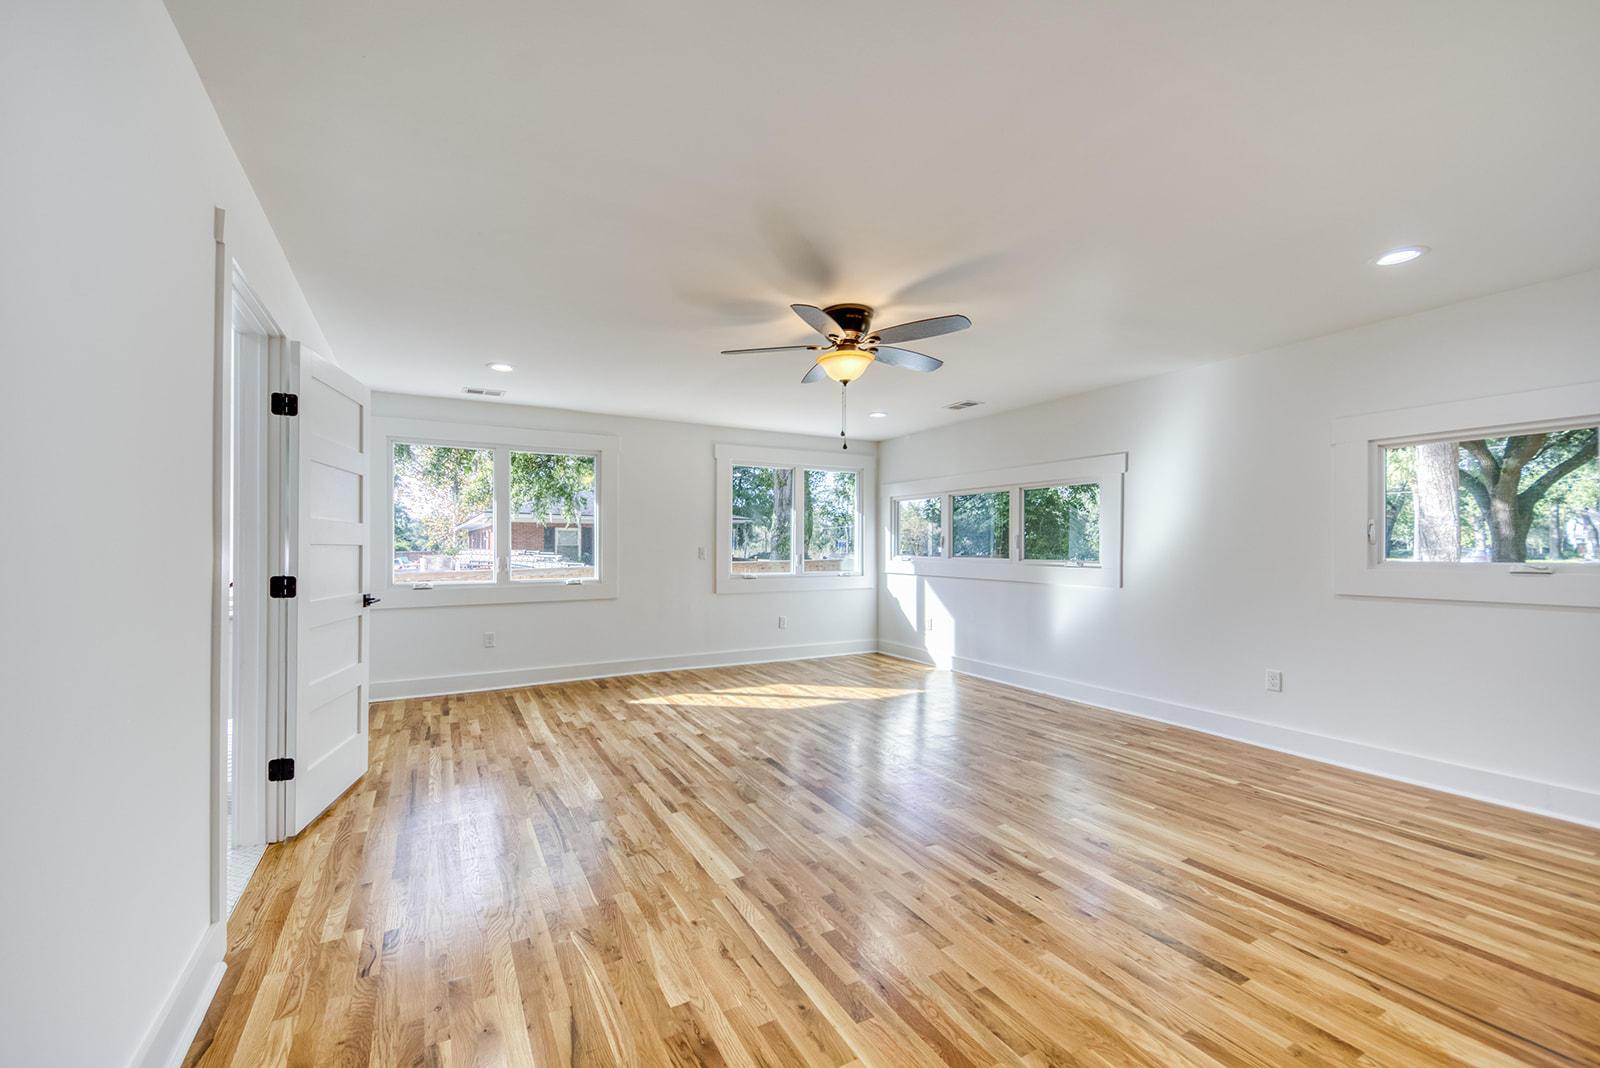 Bay View Acres Homes For Sale - 265 Coleman, Mount Pleasant, SC - 5